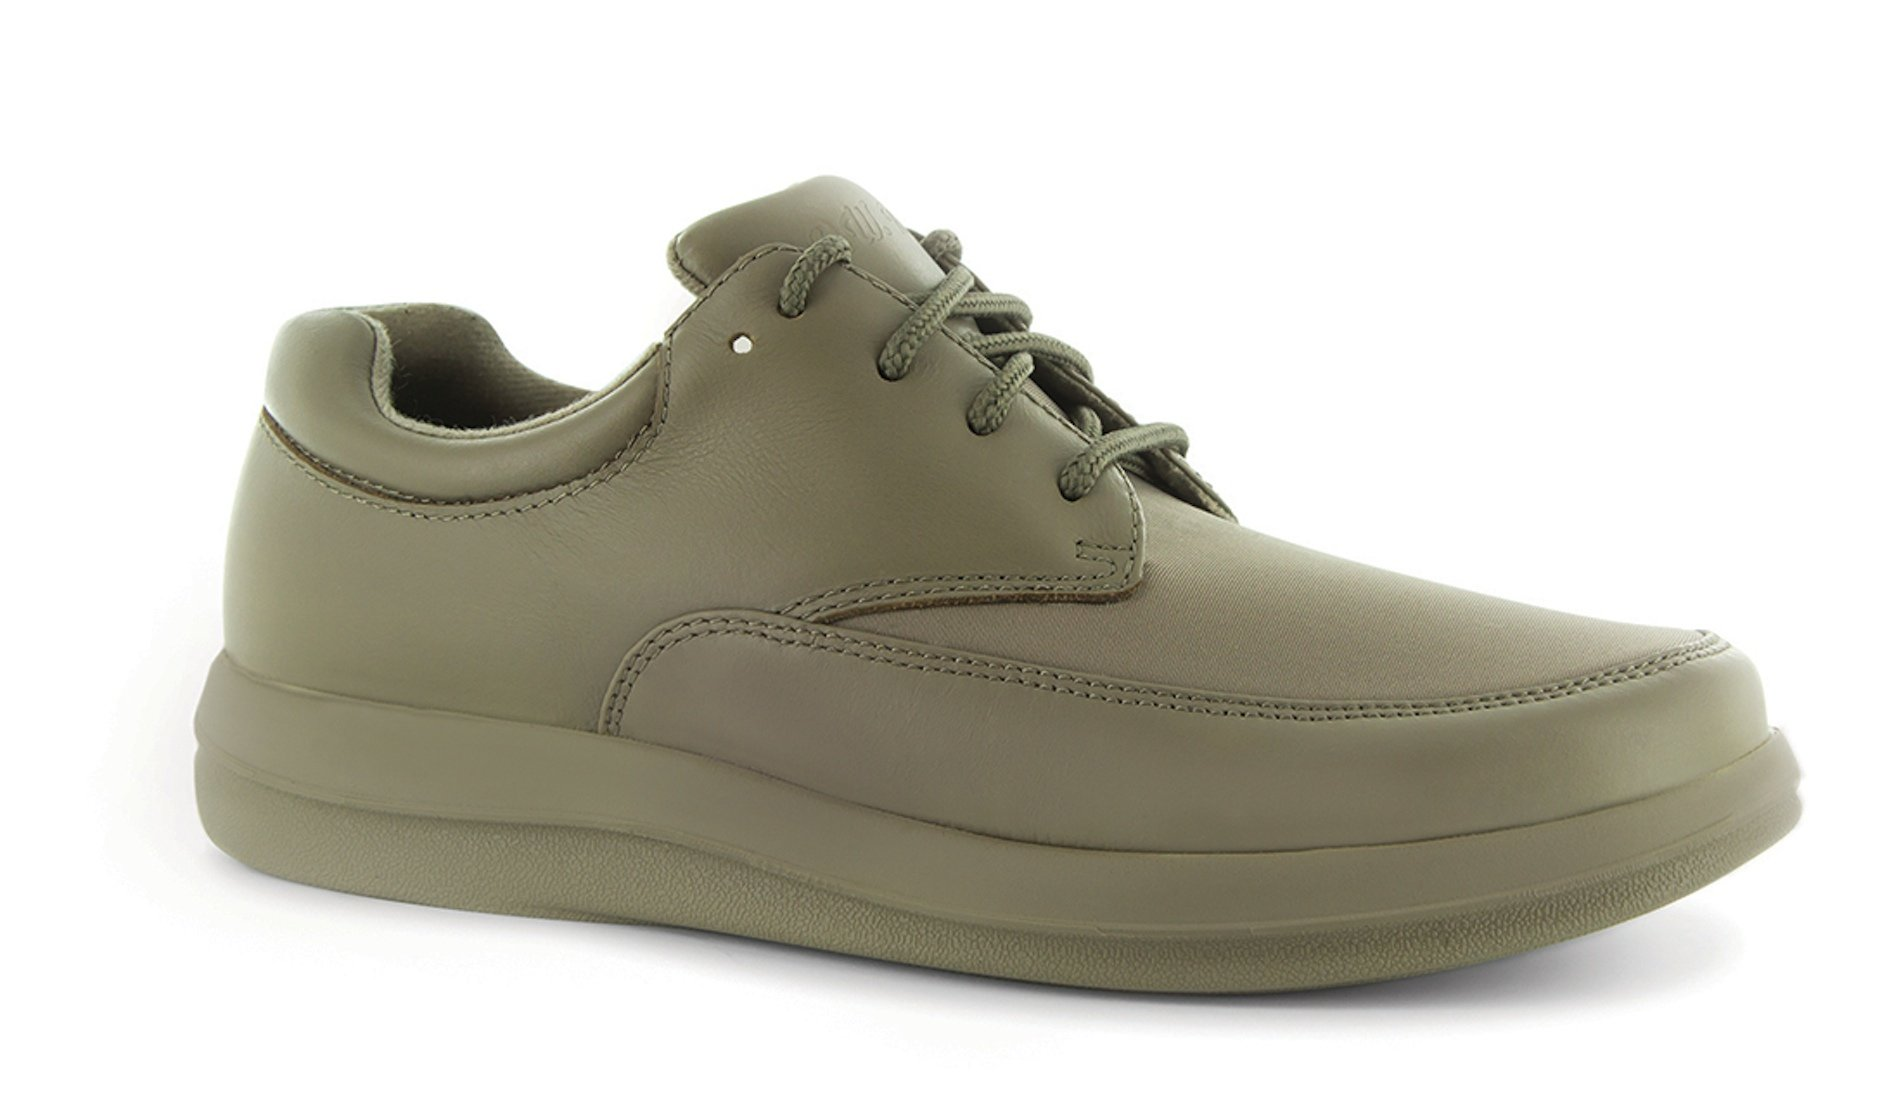 P W Minor Pleasure Women's Therapeutic Extra Depth Shoe: Taupe 8.5 Medium (D) Velcro by P.W. Minor